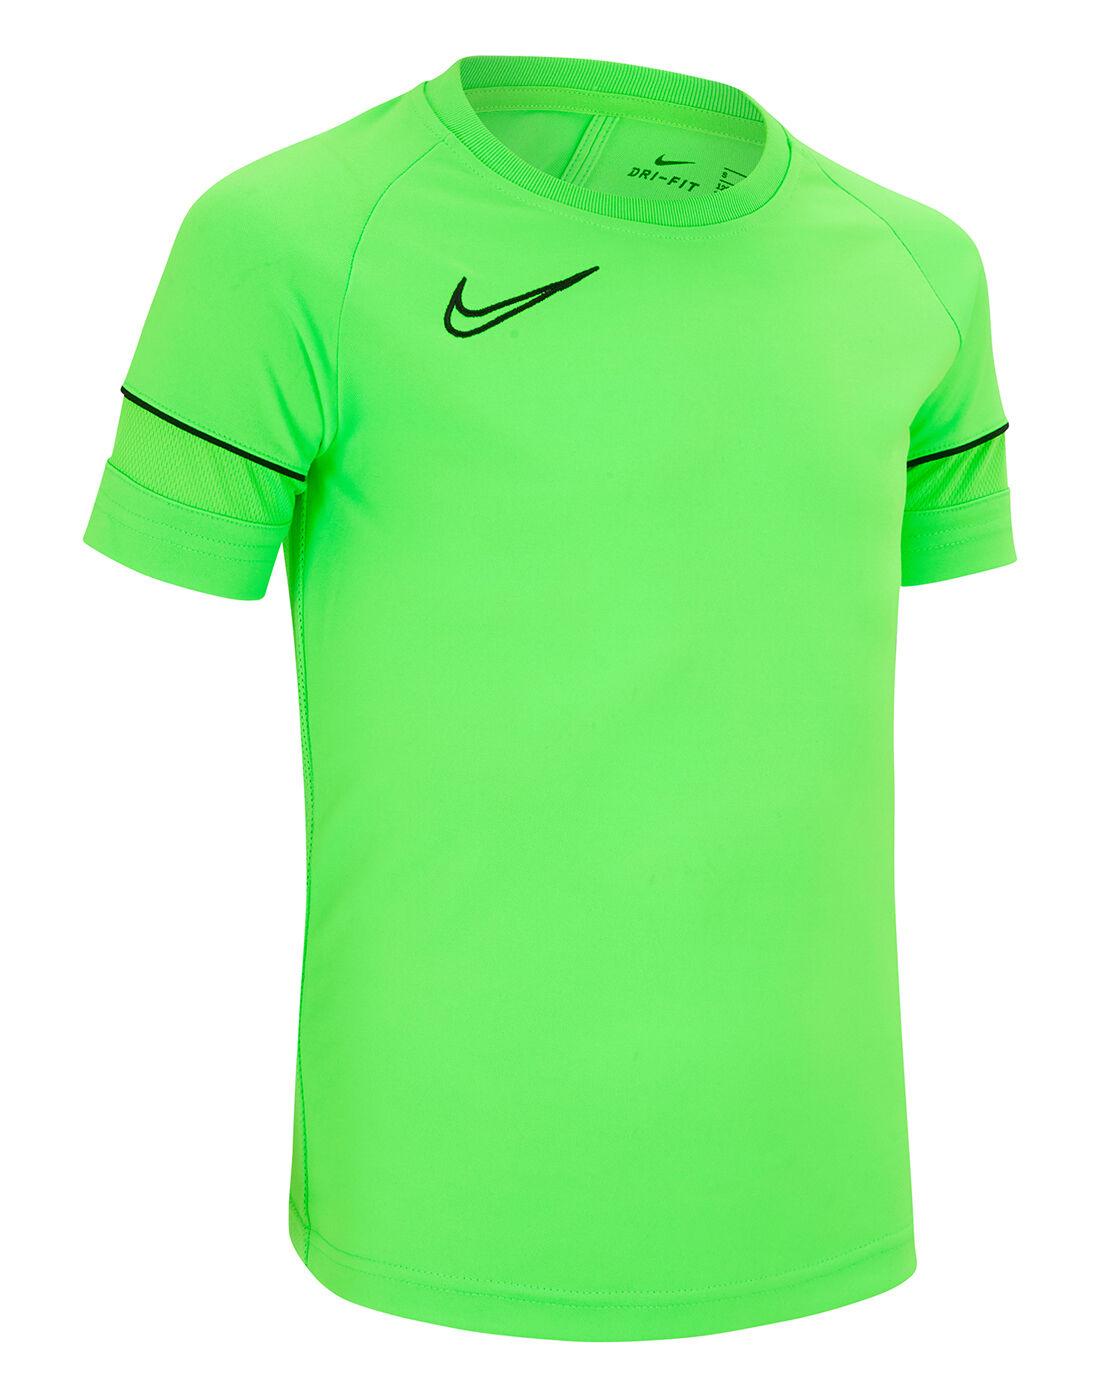 Nike nike huarache wolf grey aquatone blue eyes | Older Boys Academy T-shirt